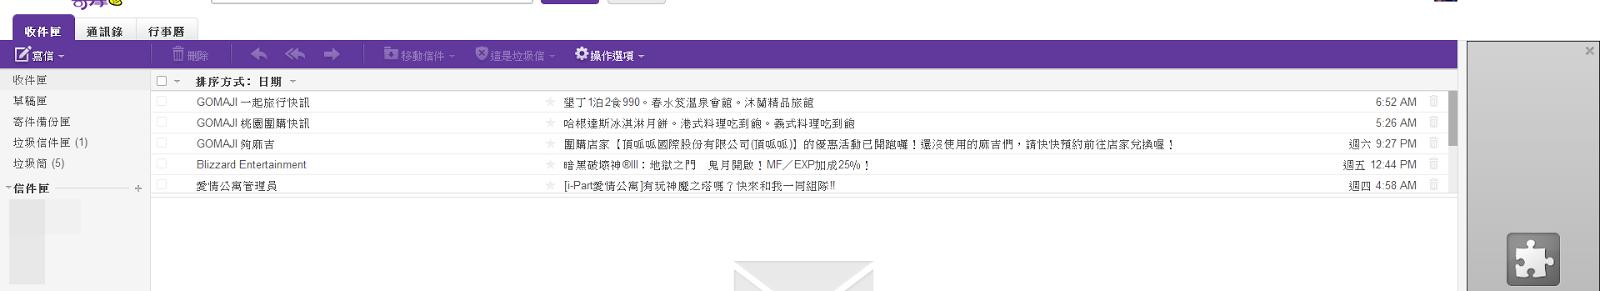 Yahoo 22吋顯示